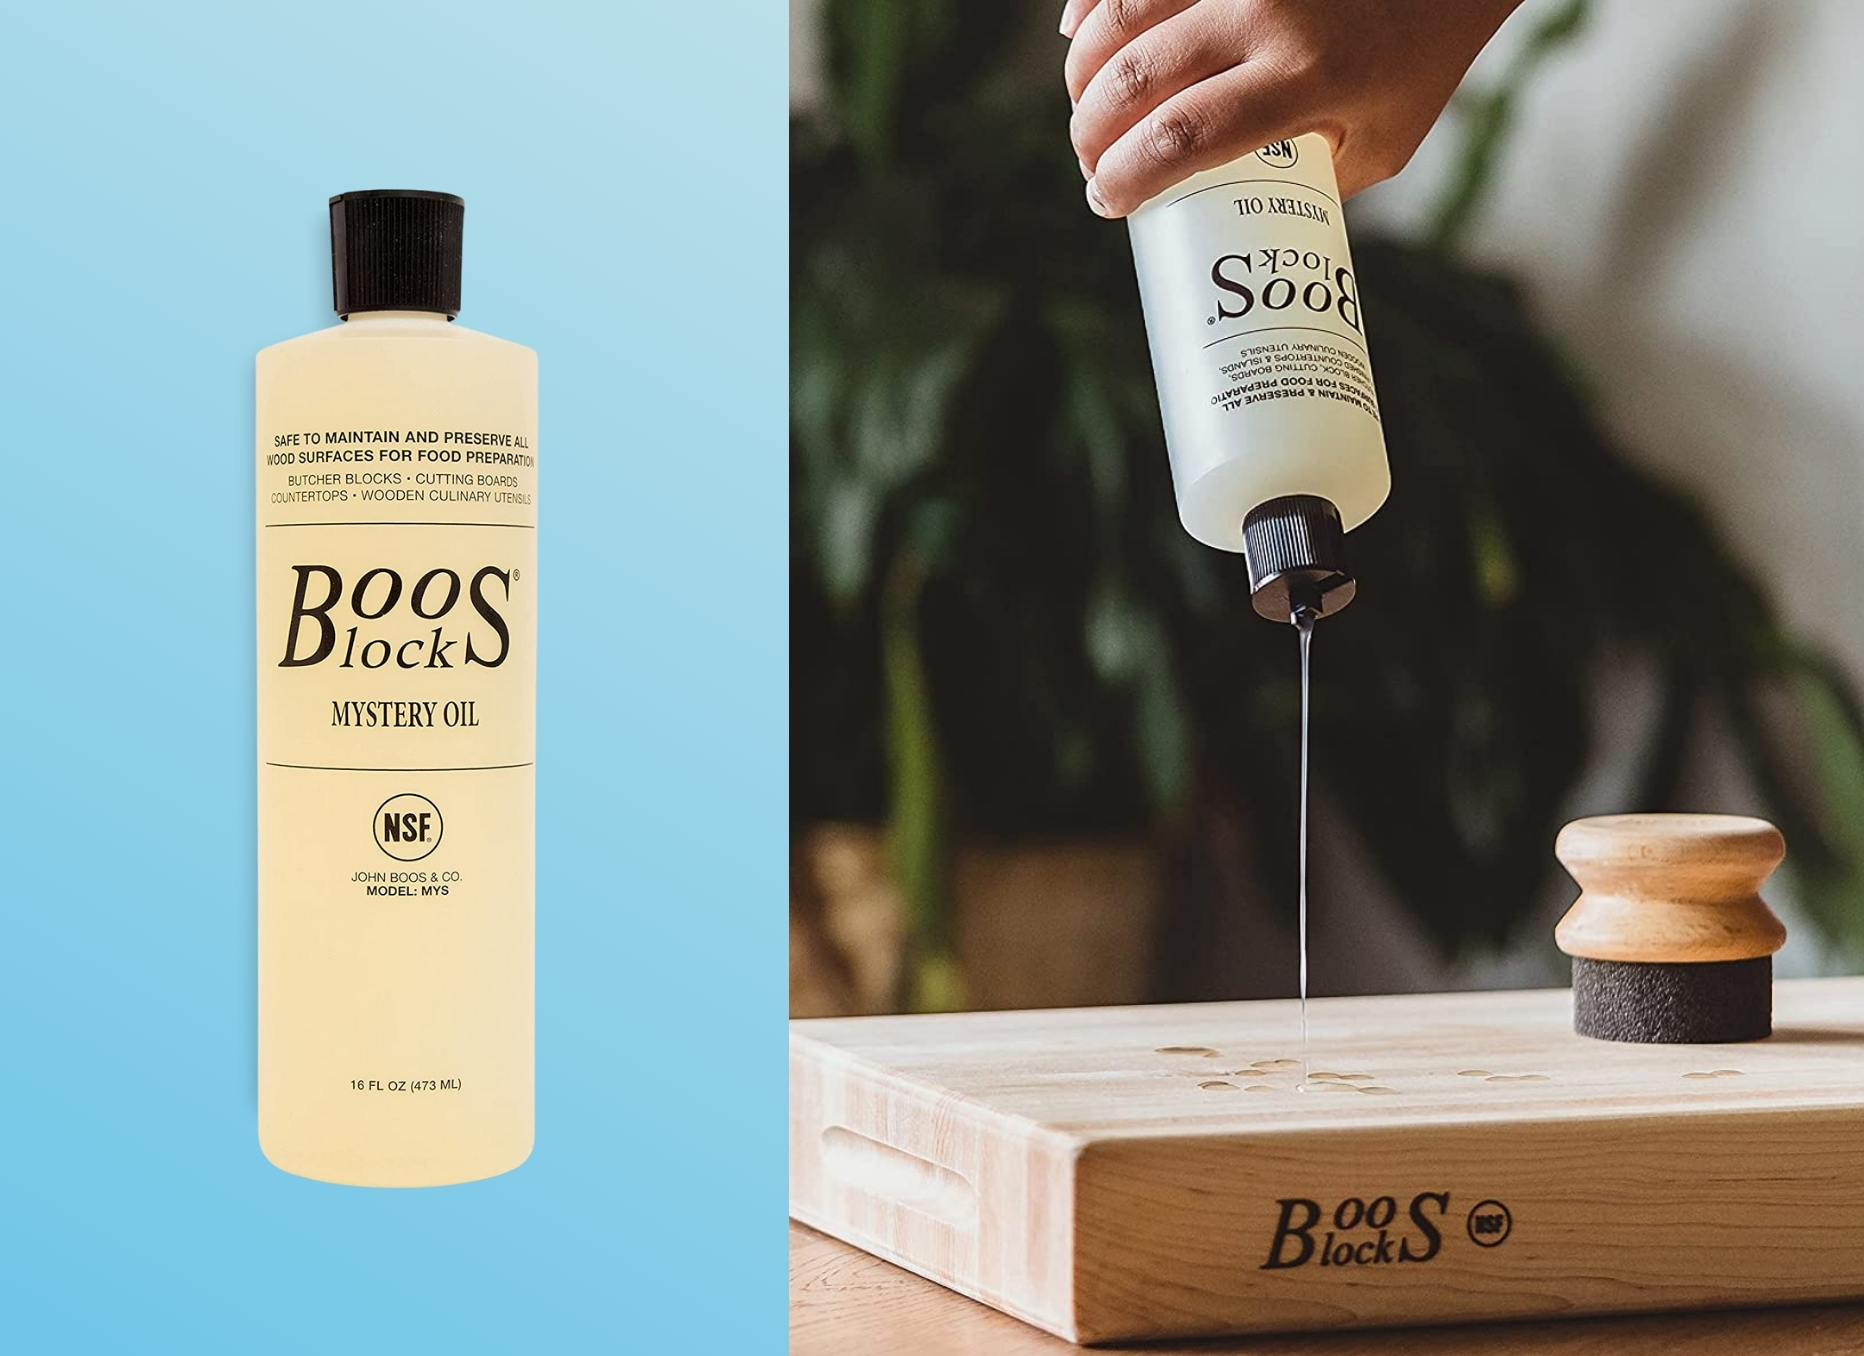 Boo's Block Mystery Oil